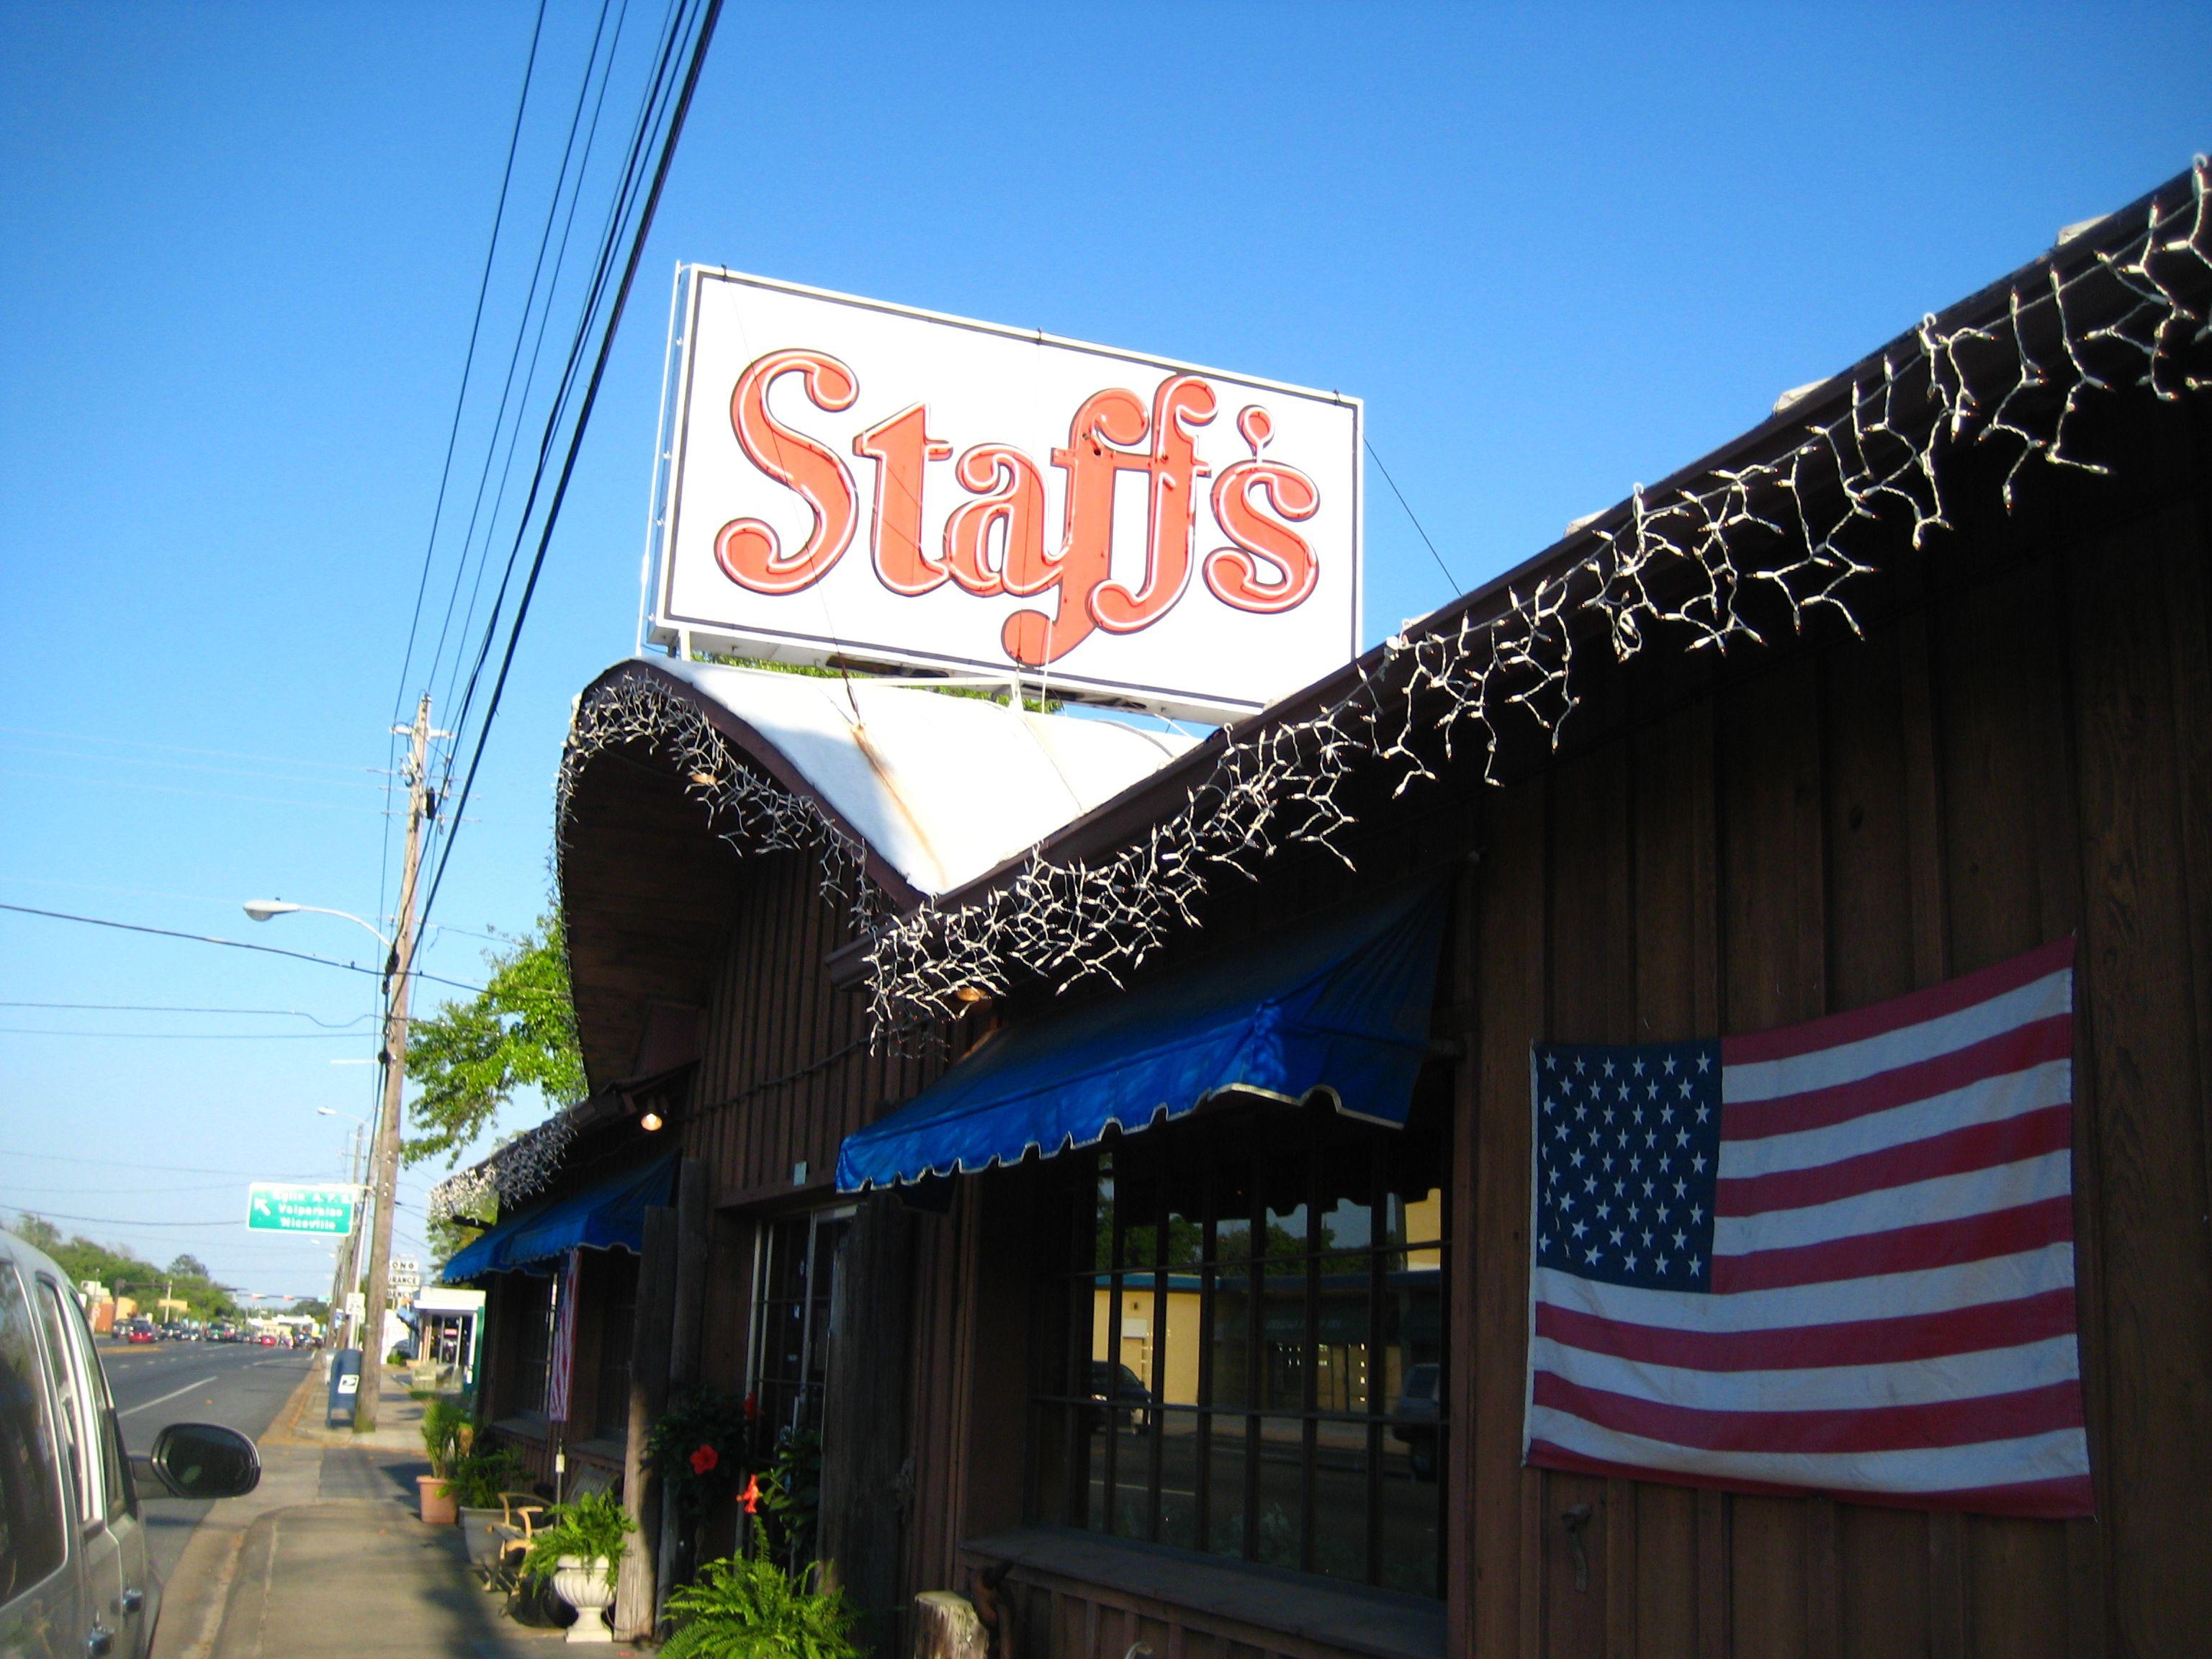 Staff S Seafood Restaurant Ft Walton Beach Florida Ol And Clic